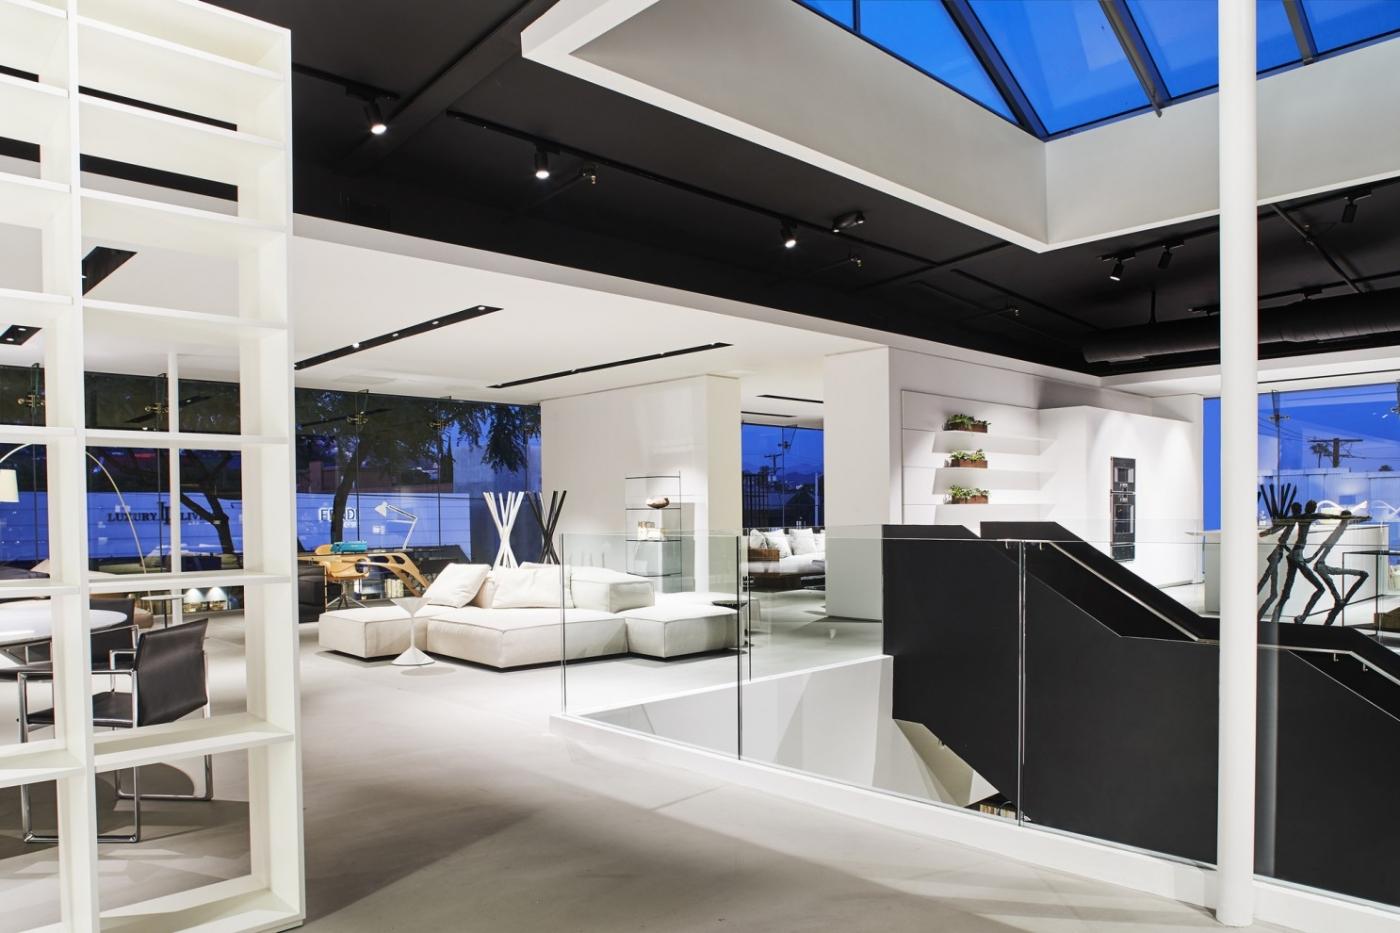 10 Incredible Shops & Showrooms in LA 2 10